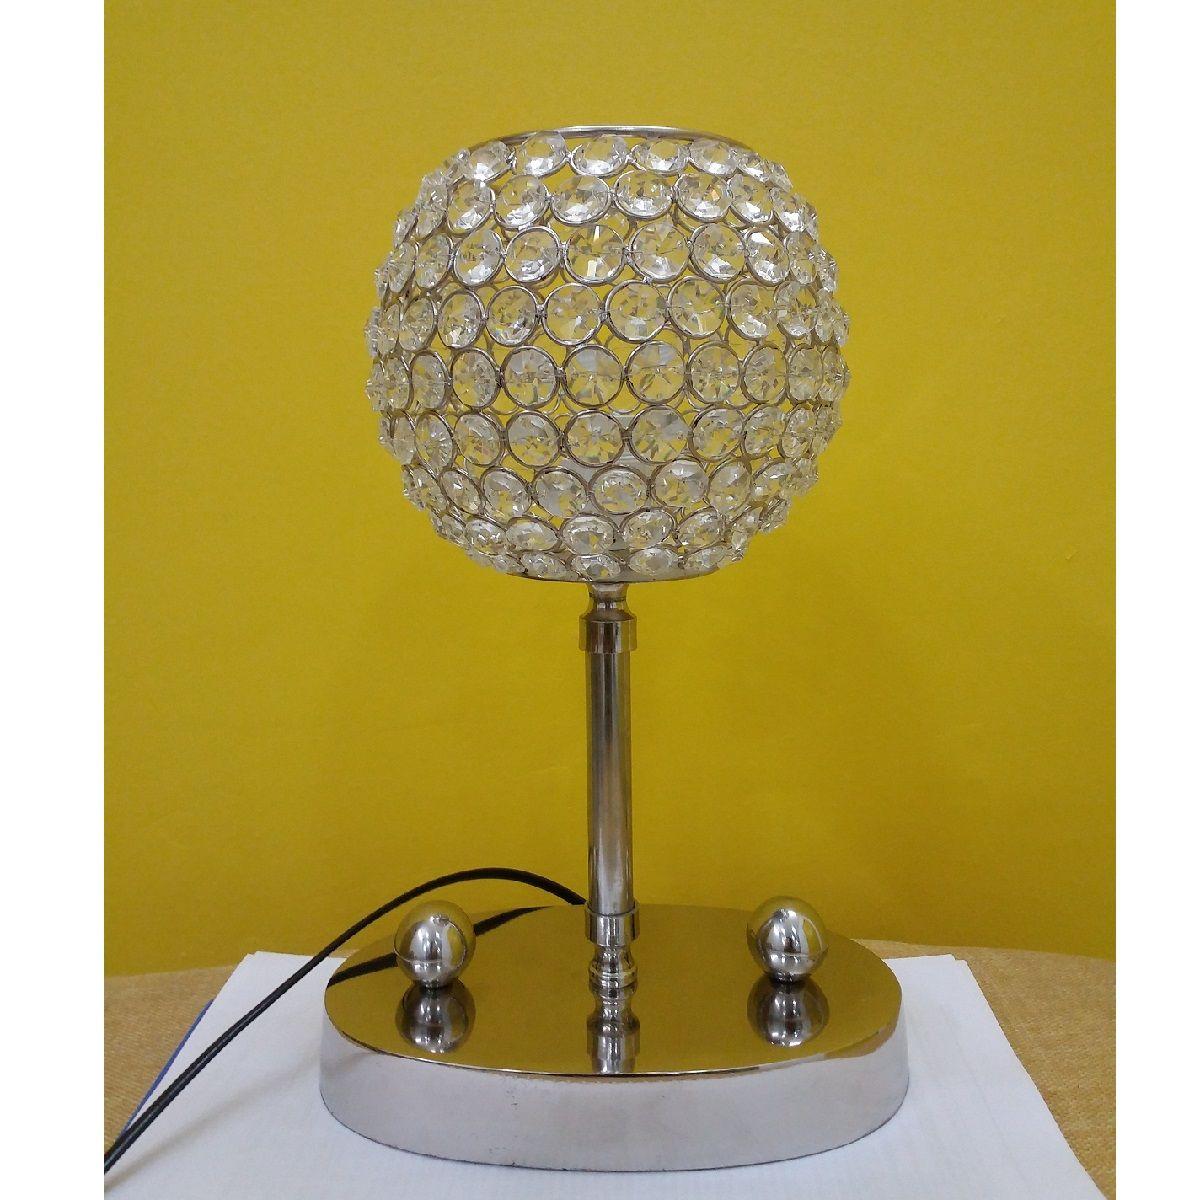 Circular White Crystal Electric Lamp Lamp Electric Lamp Electricity